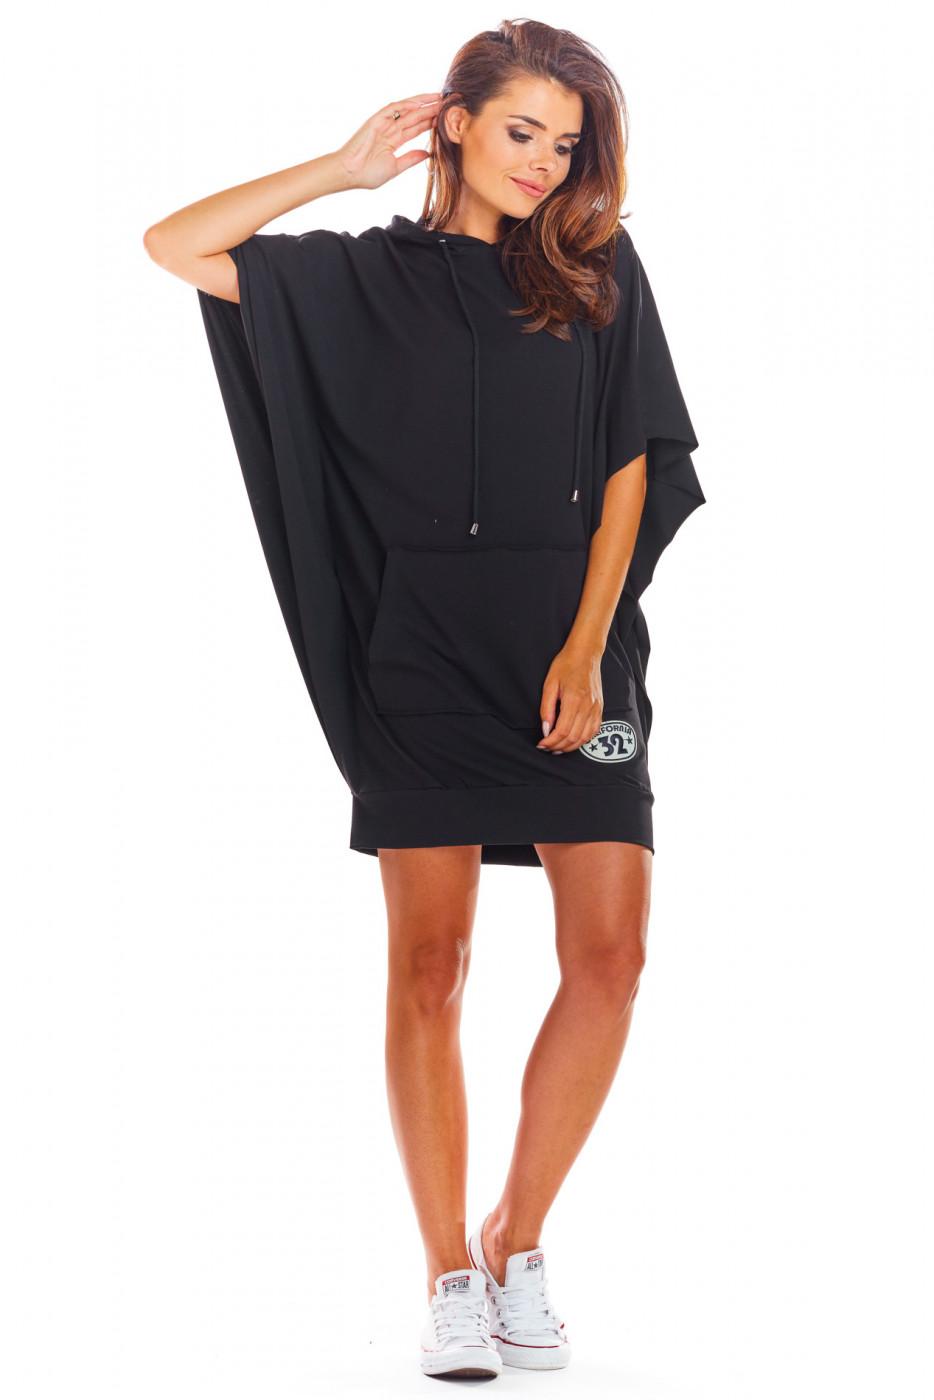 Infinite You Woman's Dress M215